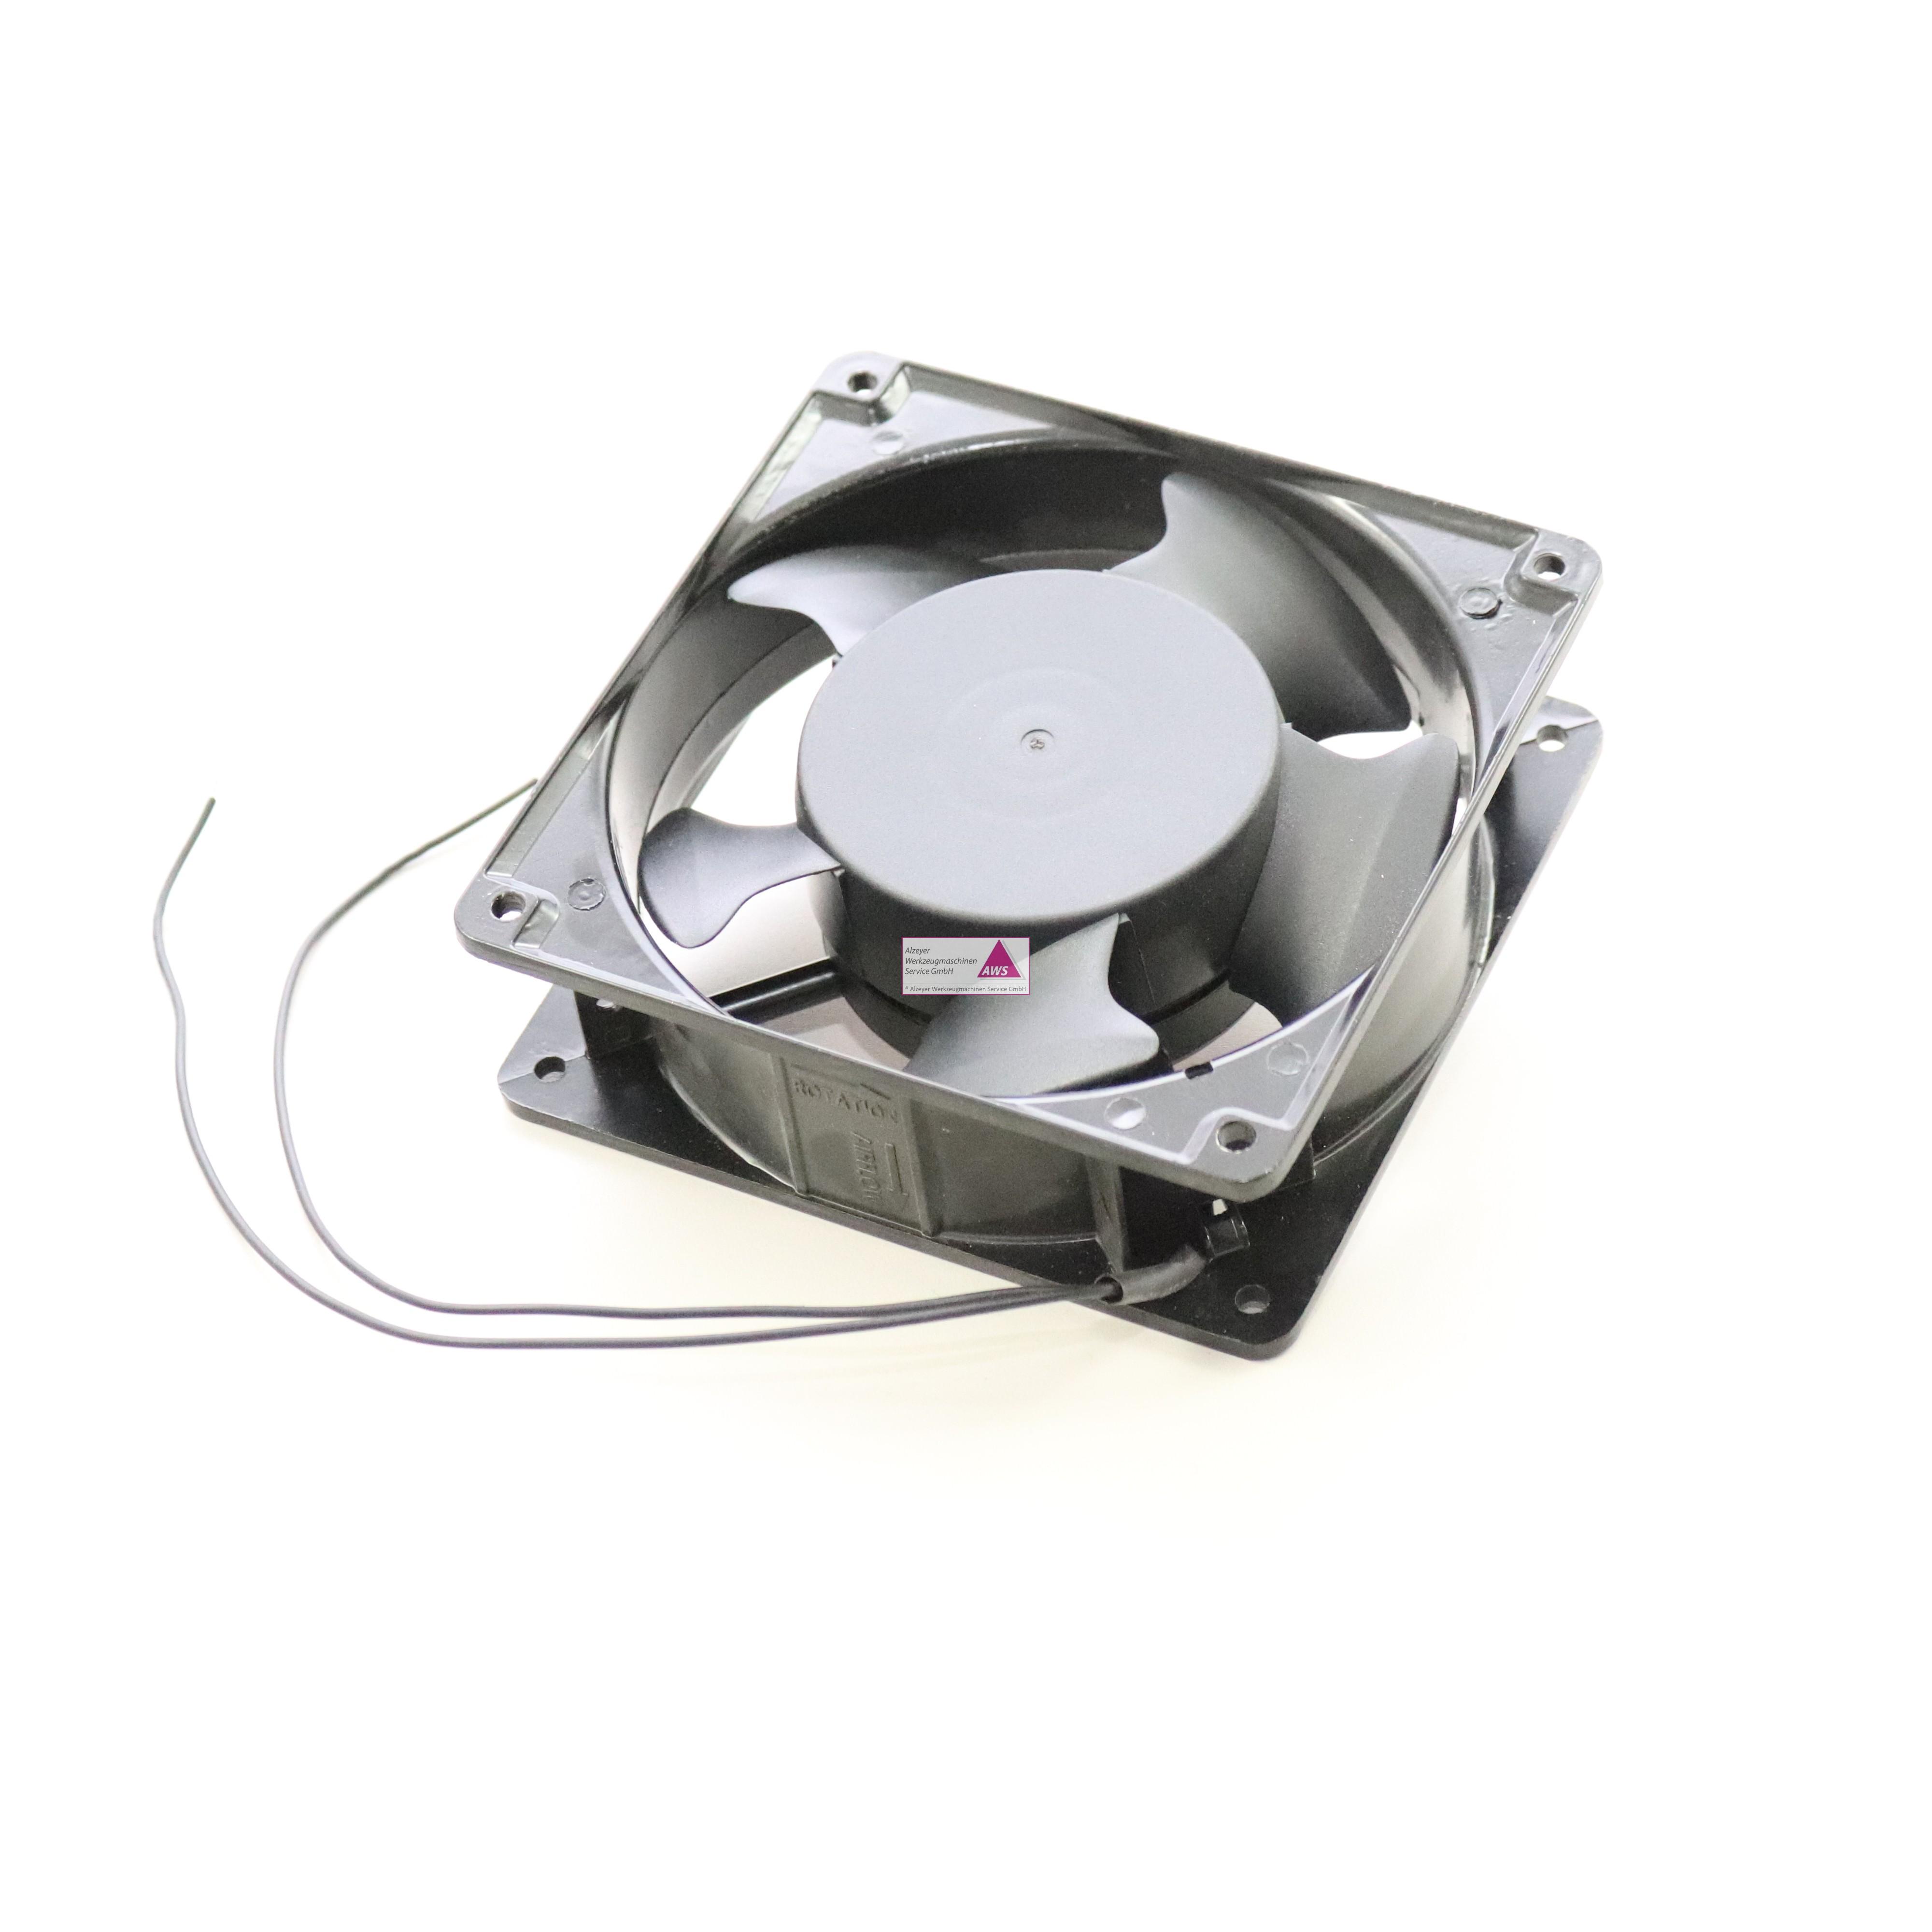 Ventilator Viereckig 119x119x38mm dick (400VAC)